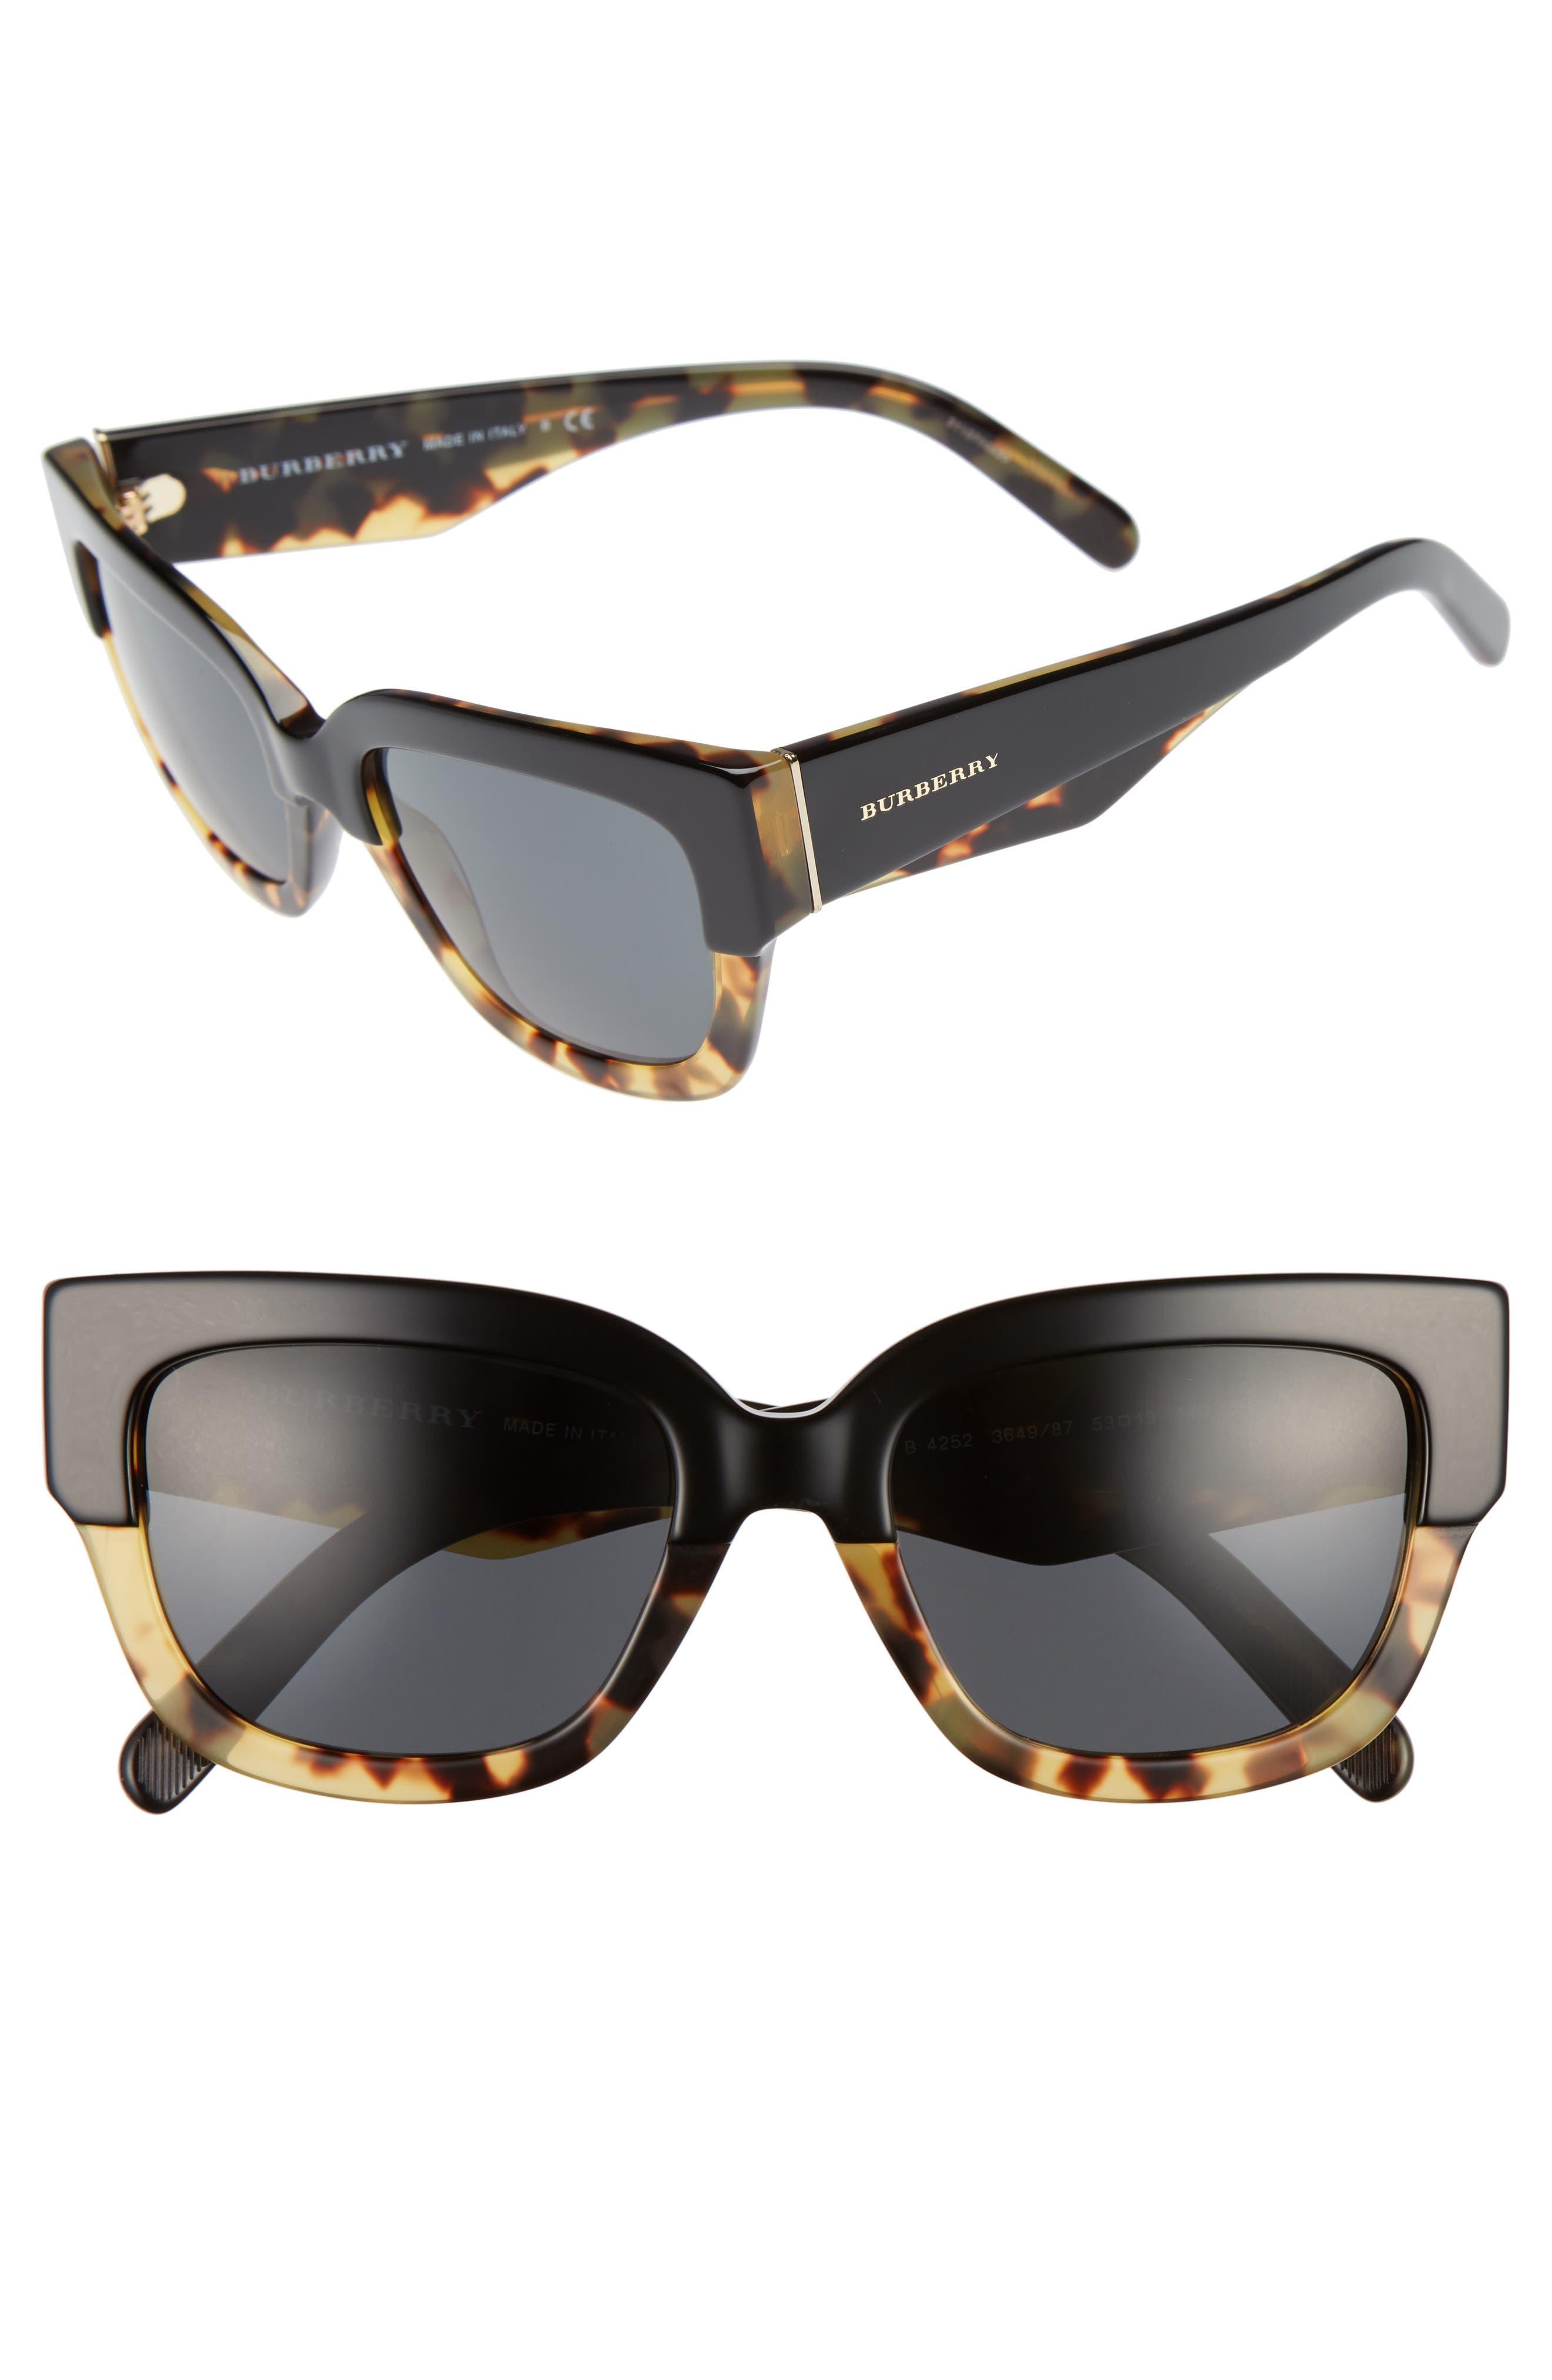 Burberry 53mm Sunglasses